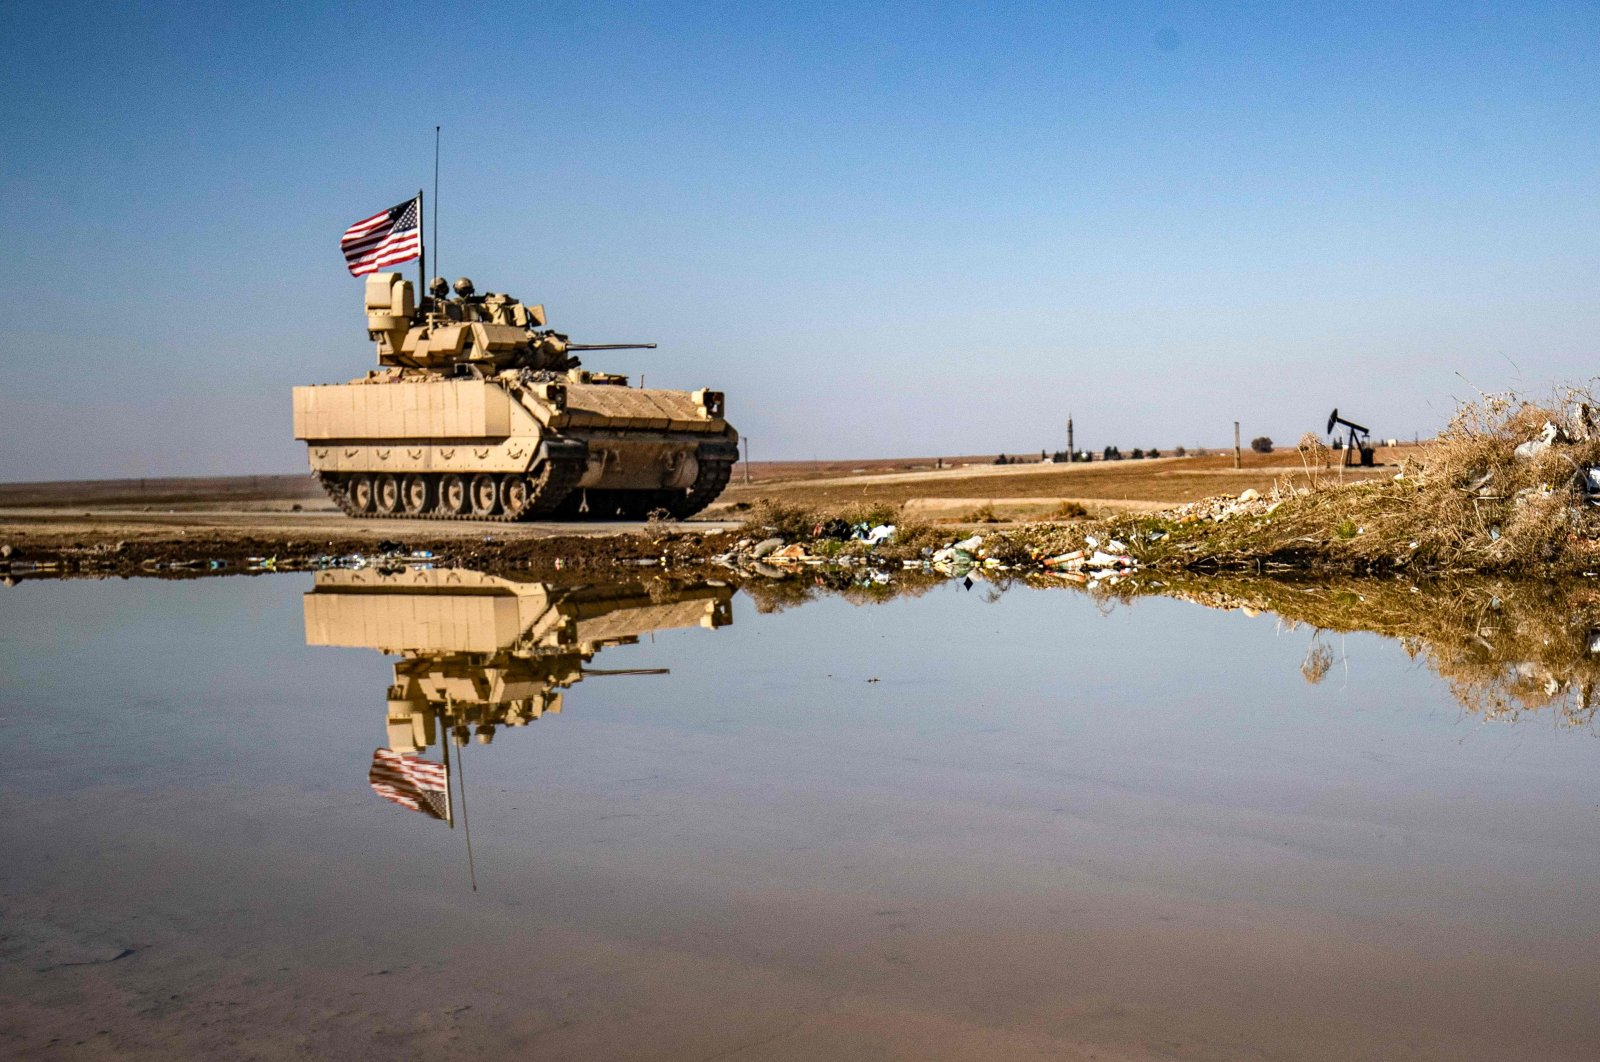 A U.S. Bradley Fighting Vehicle (BFV) patrols in the countryside near al-Malikiyah (Derik) in Syria's northeastern Hasakah province, Feb. 2, 2021. (AFP Photo)